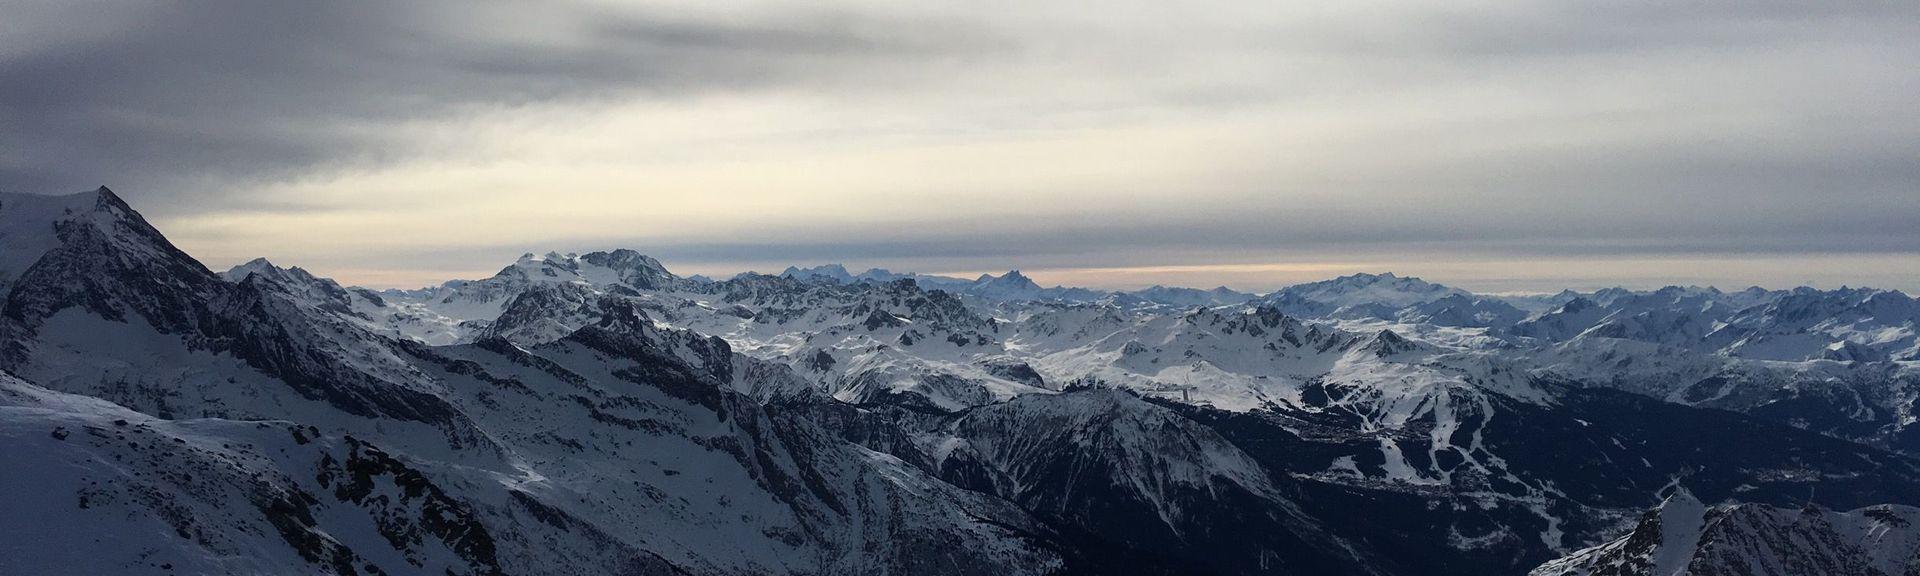 Belle Plagne, Macot-la-Plagne, Auvergne-Rhône-Alpes, Frankrike